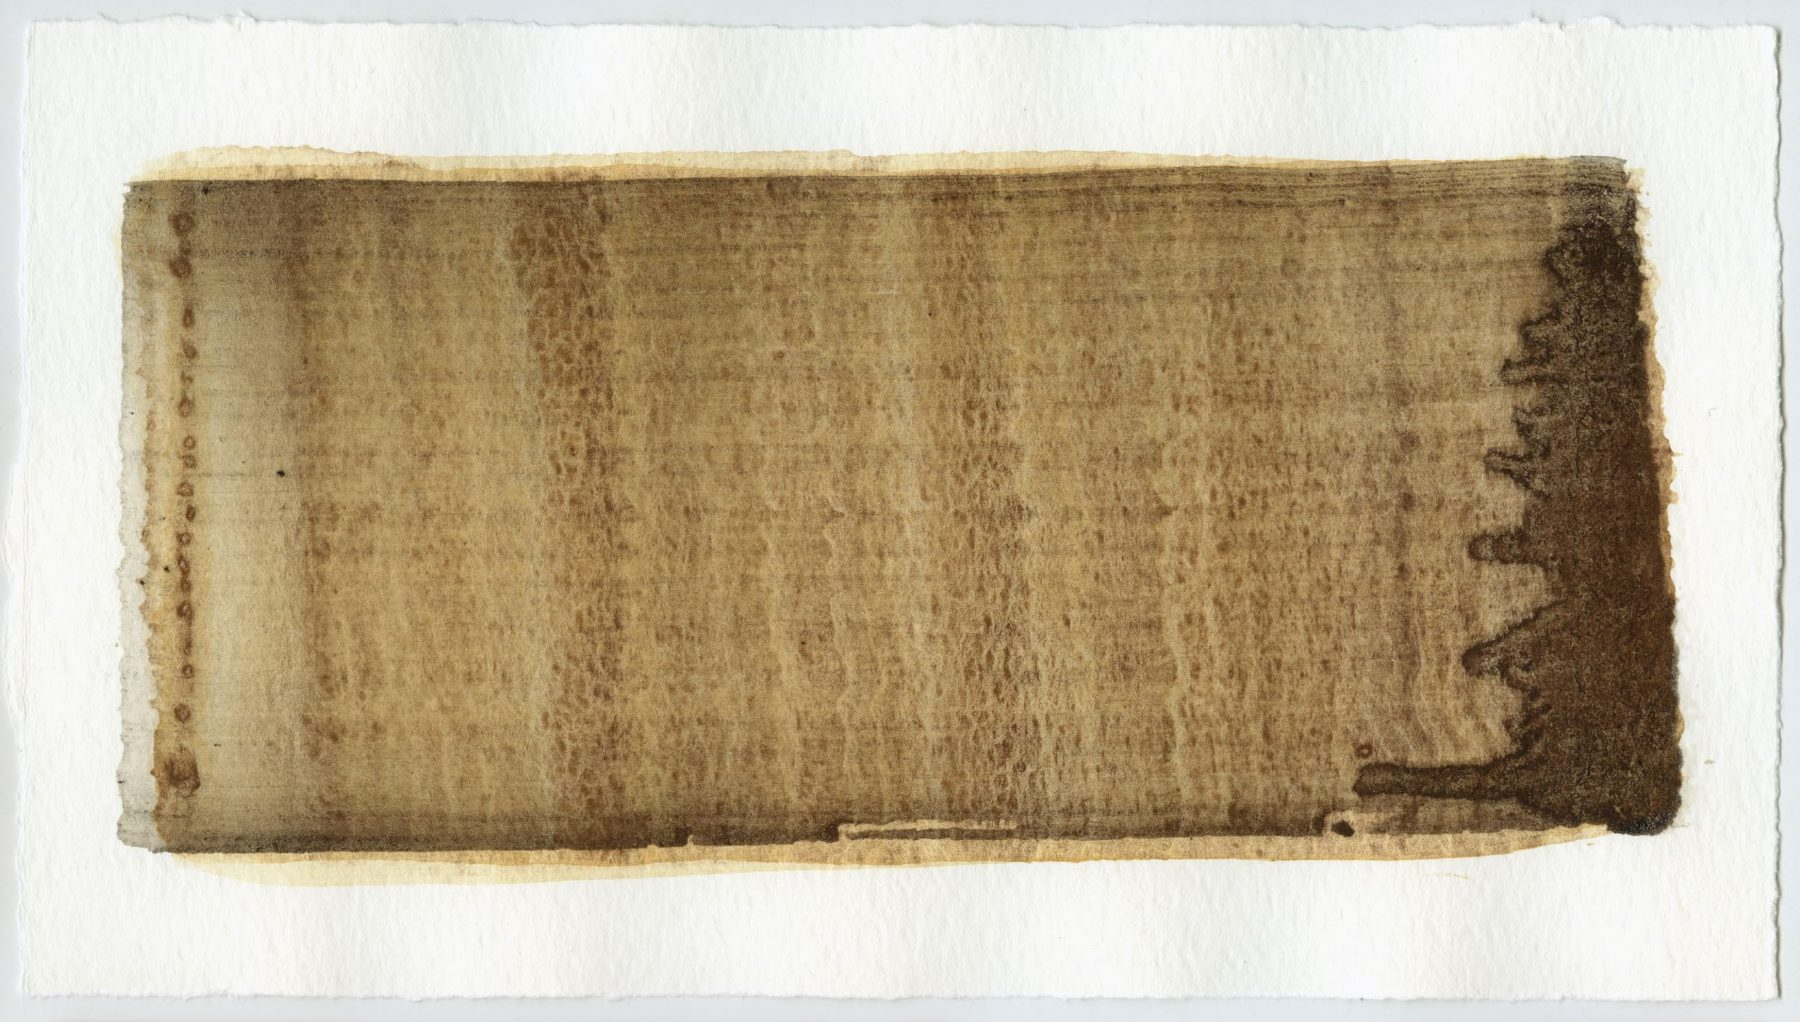 Brush stroke no. 116 - Selfmade pigment: Slingerpad bruin, IJzeroer